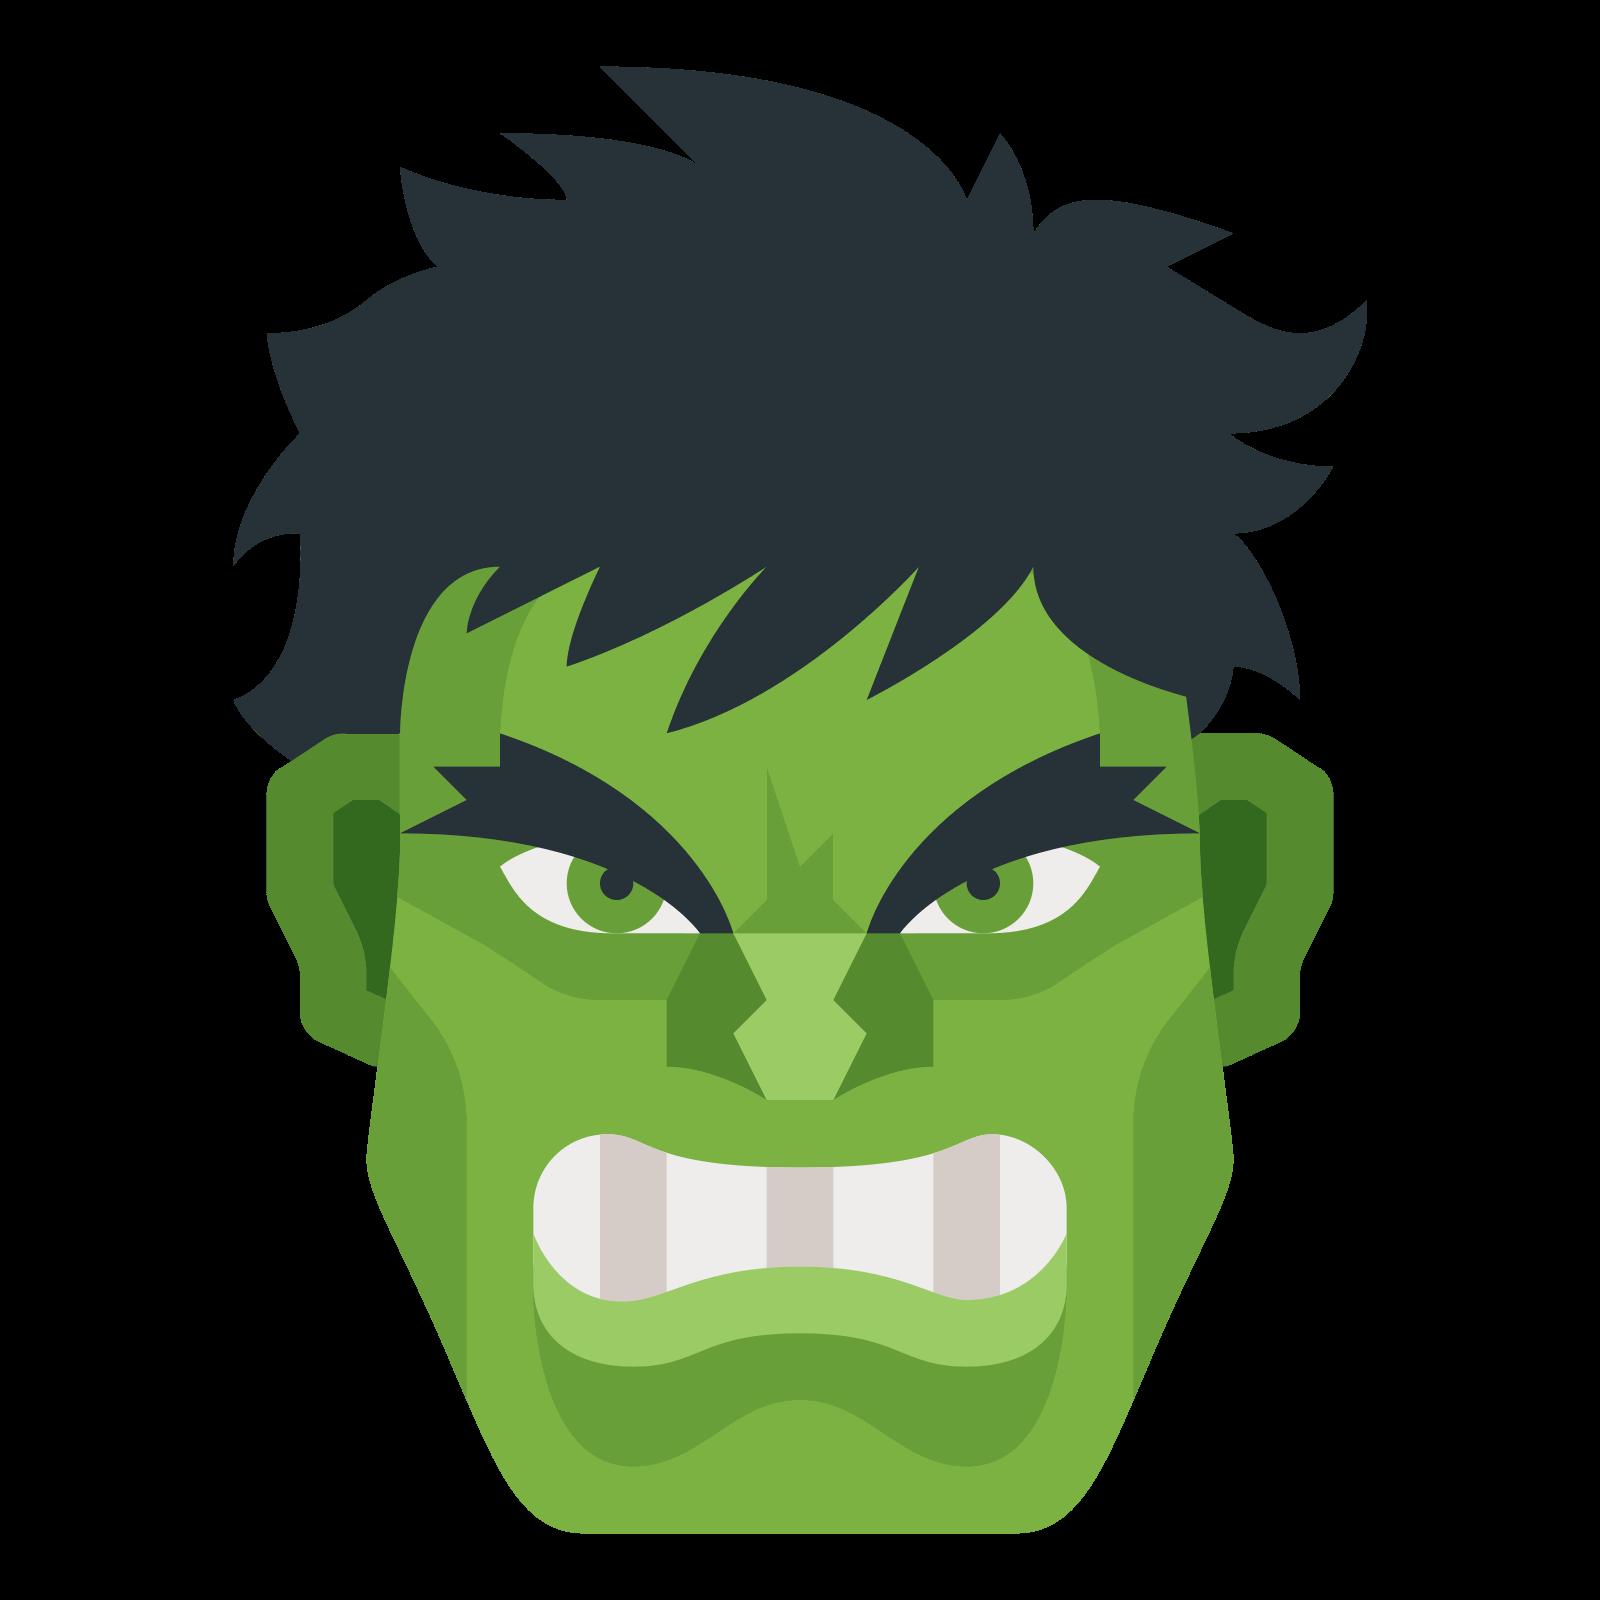 Icon emoji face png. Head clipart hulk